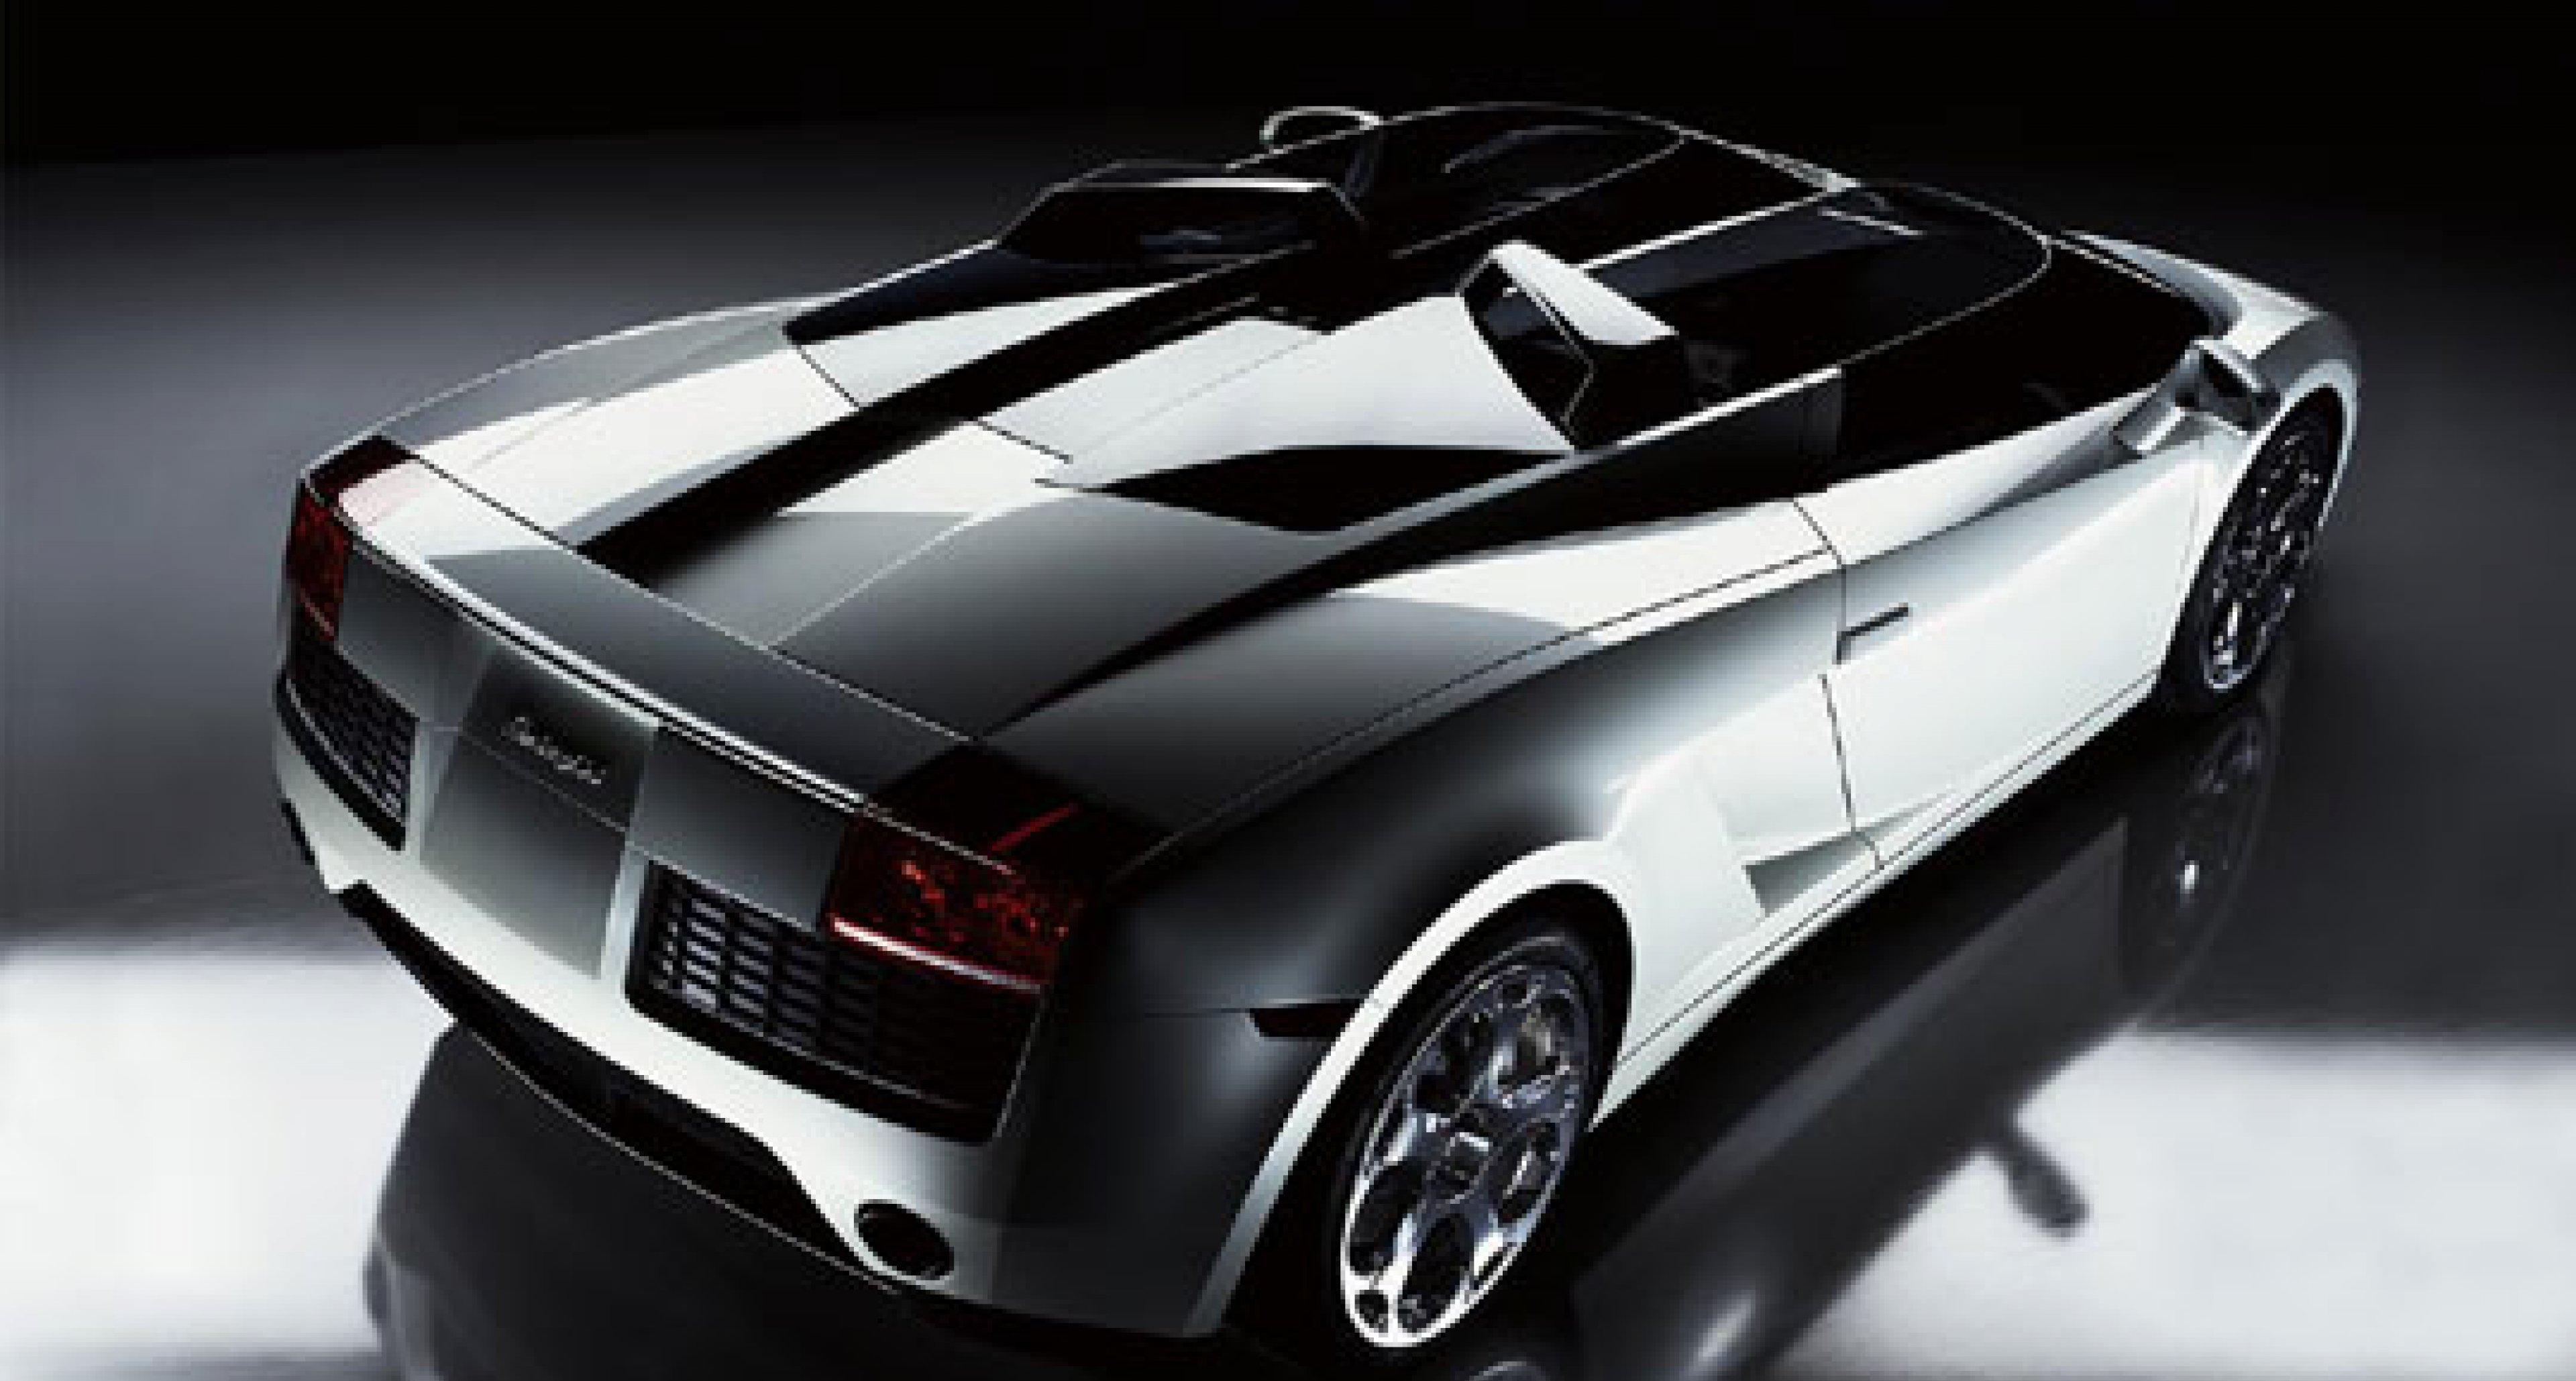 Lamborghini Concept S at Geneva